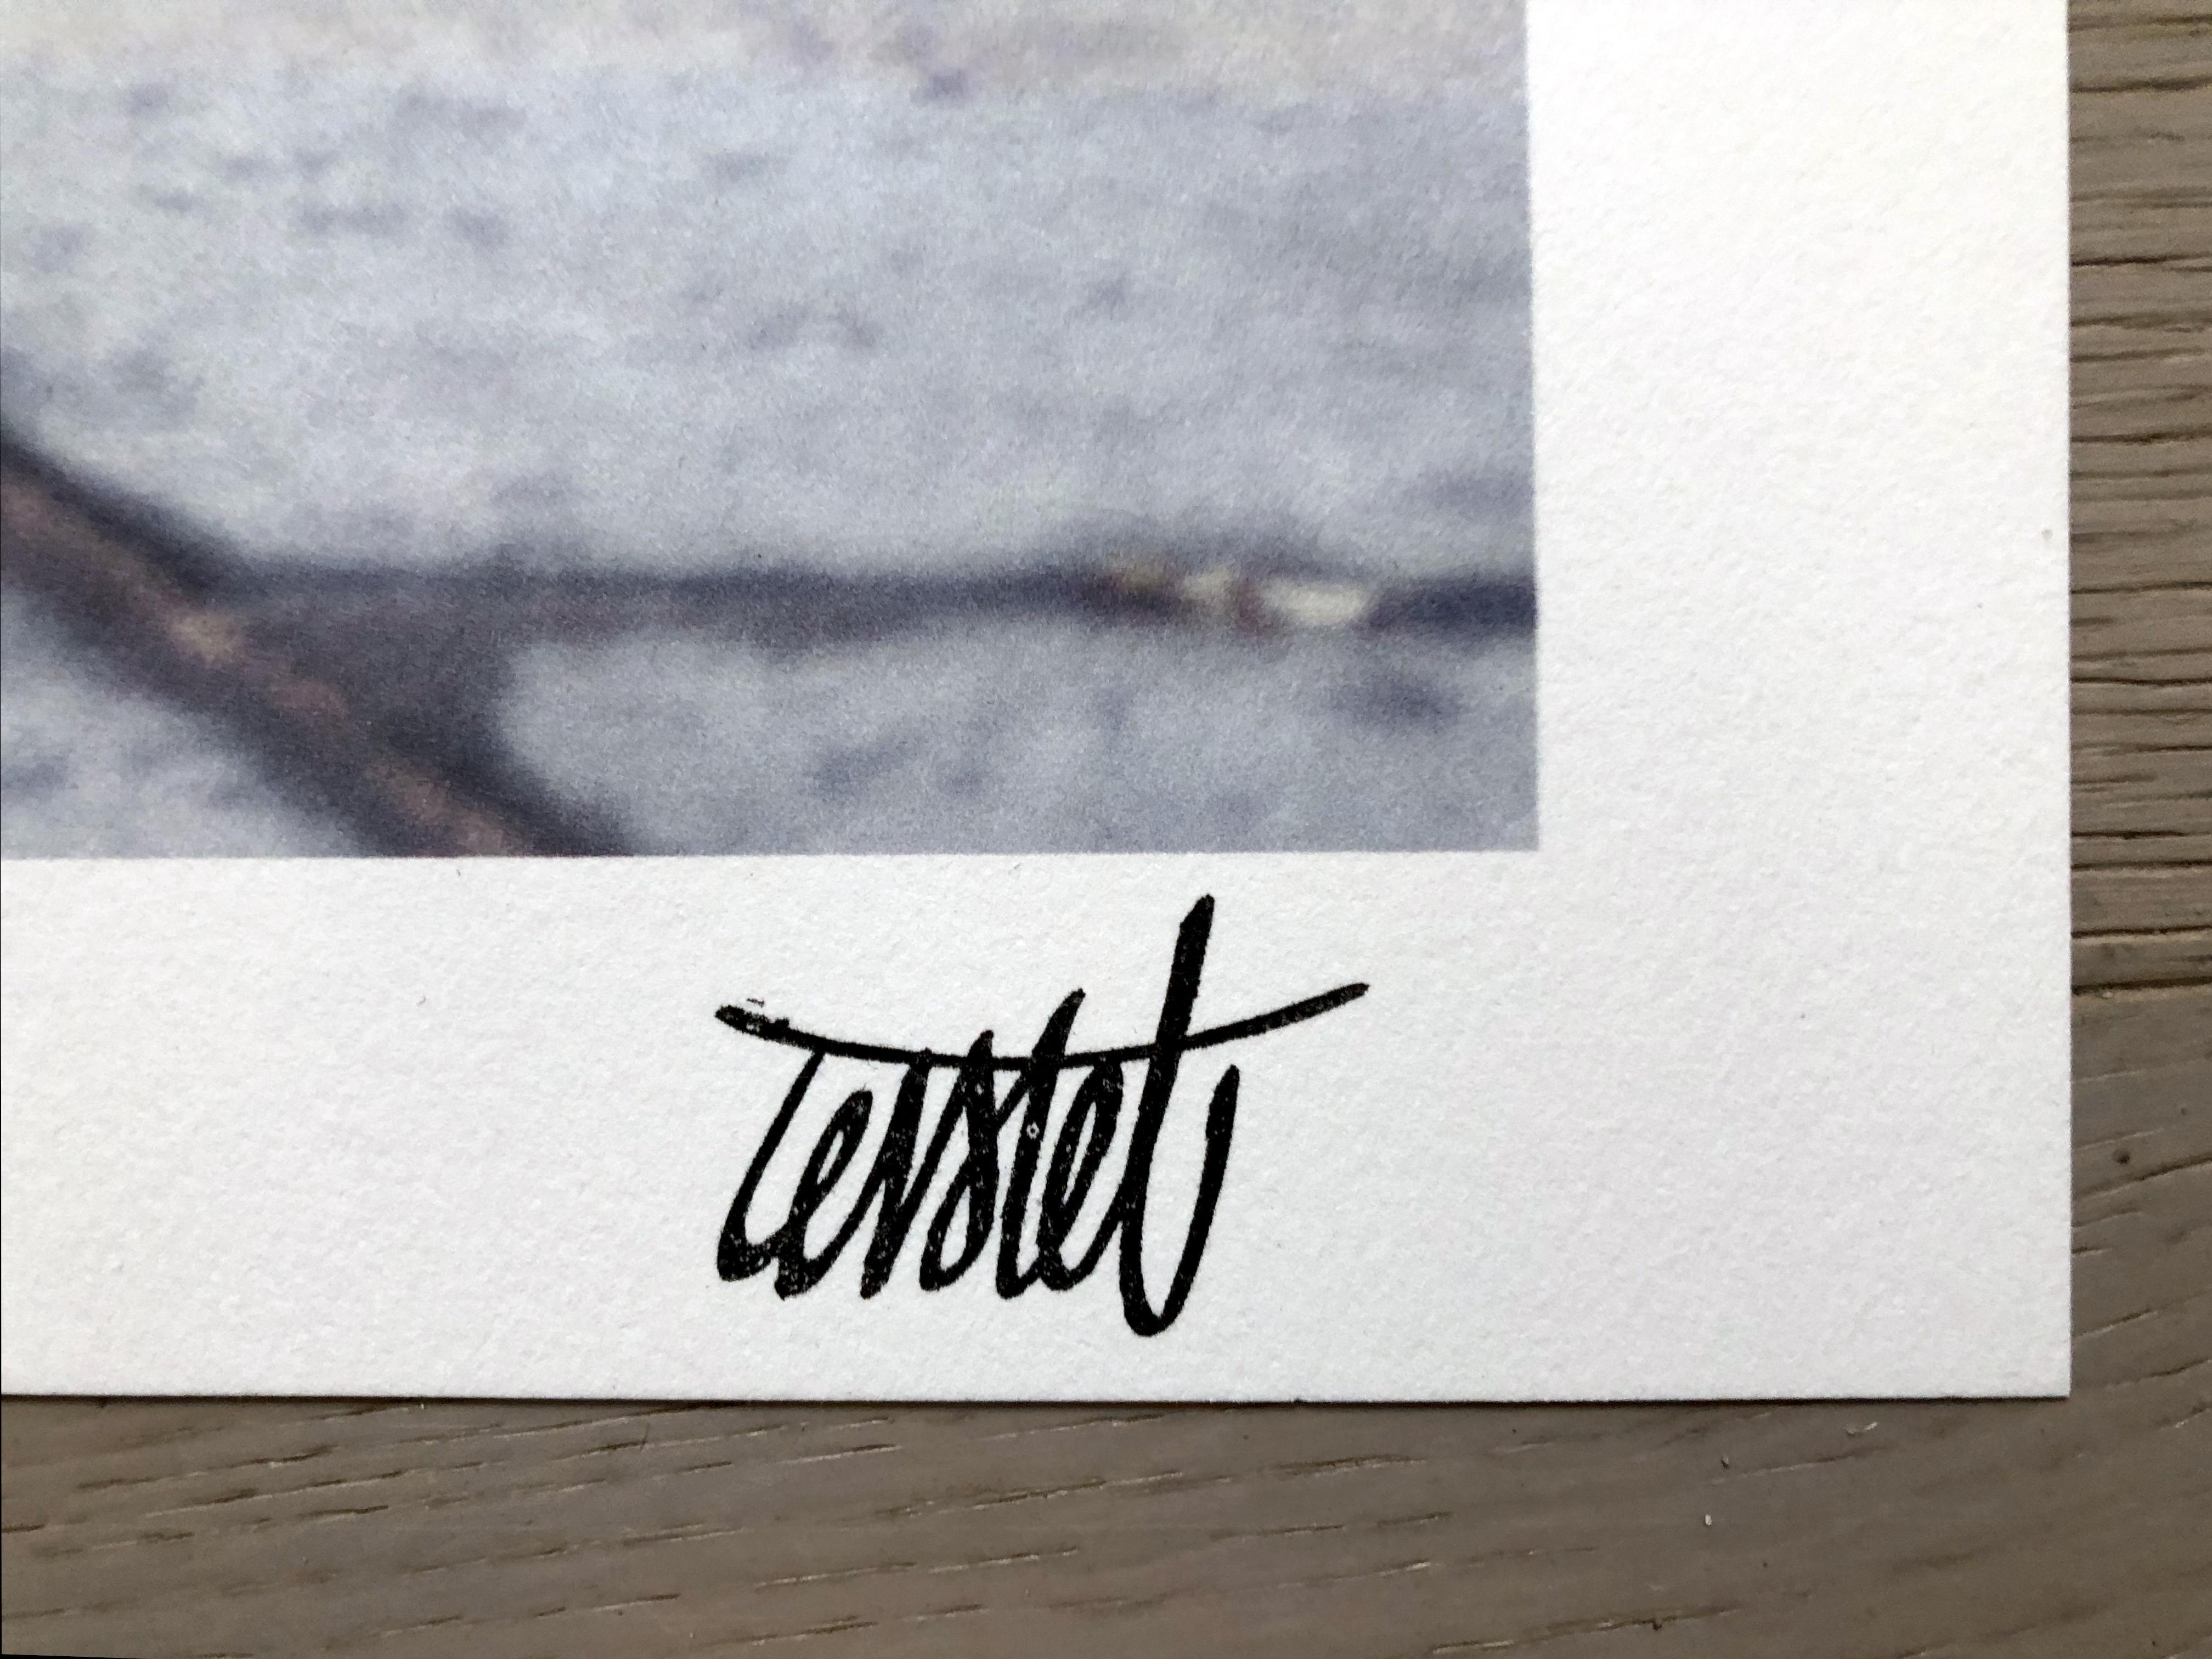 Signature au tampon de Levalet